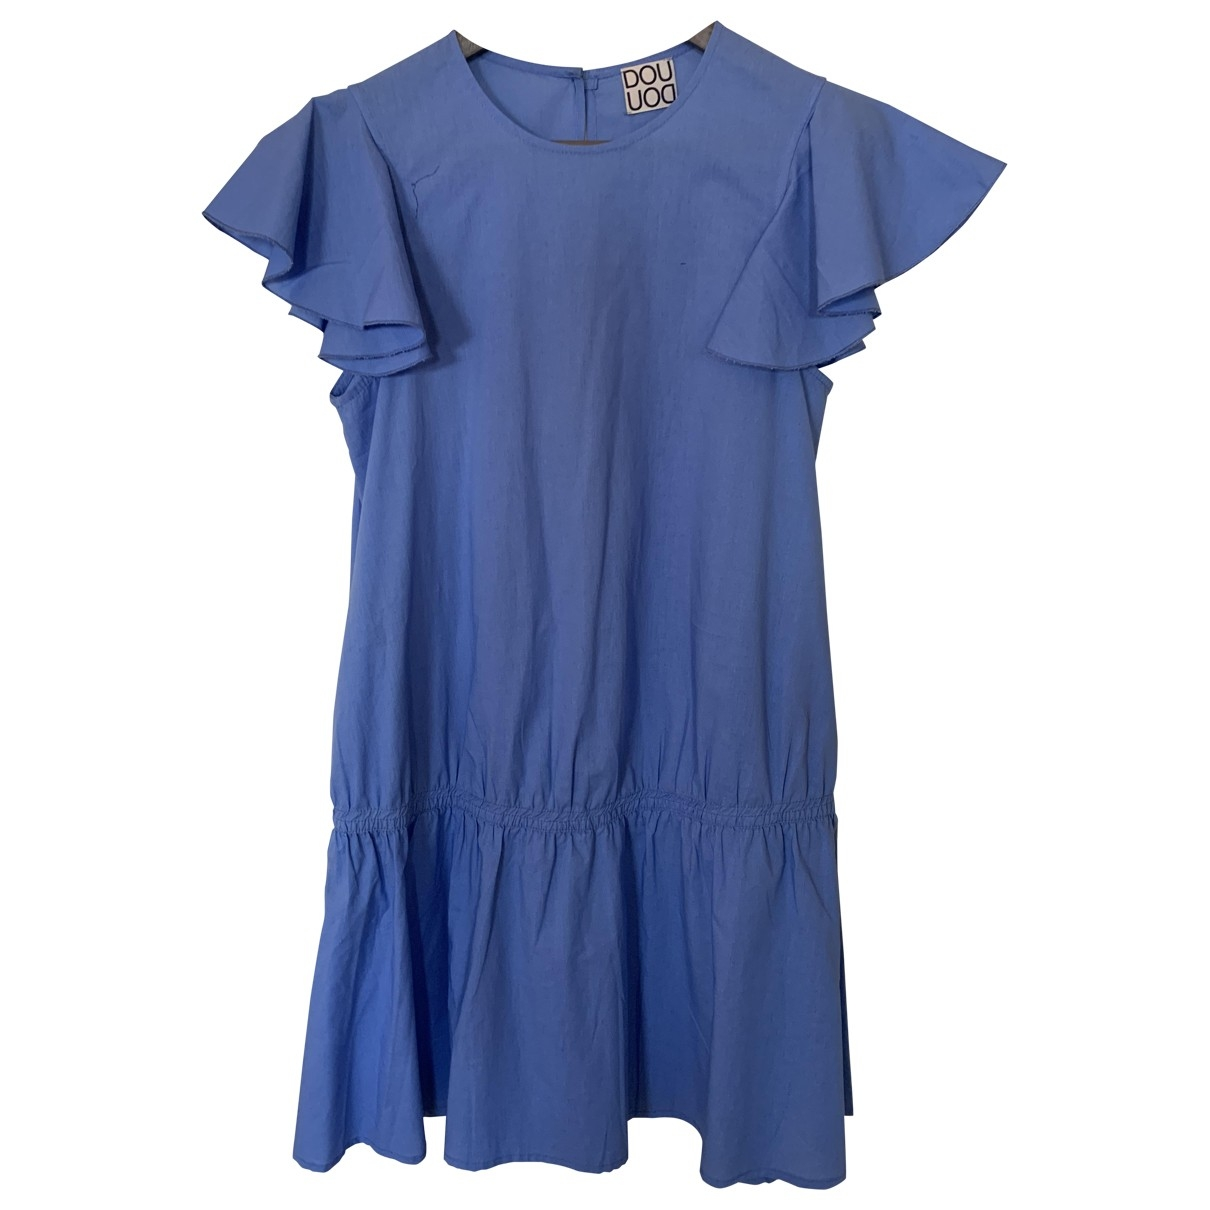 Douuod \N Blue Cotton - elasthane dress for Women 40 IT